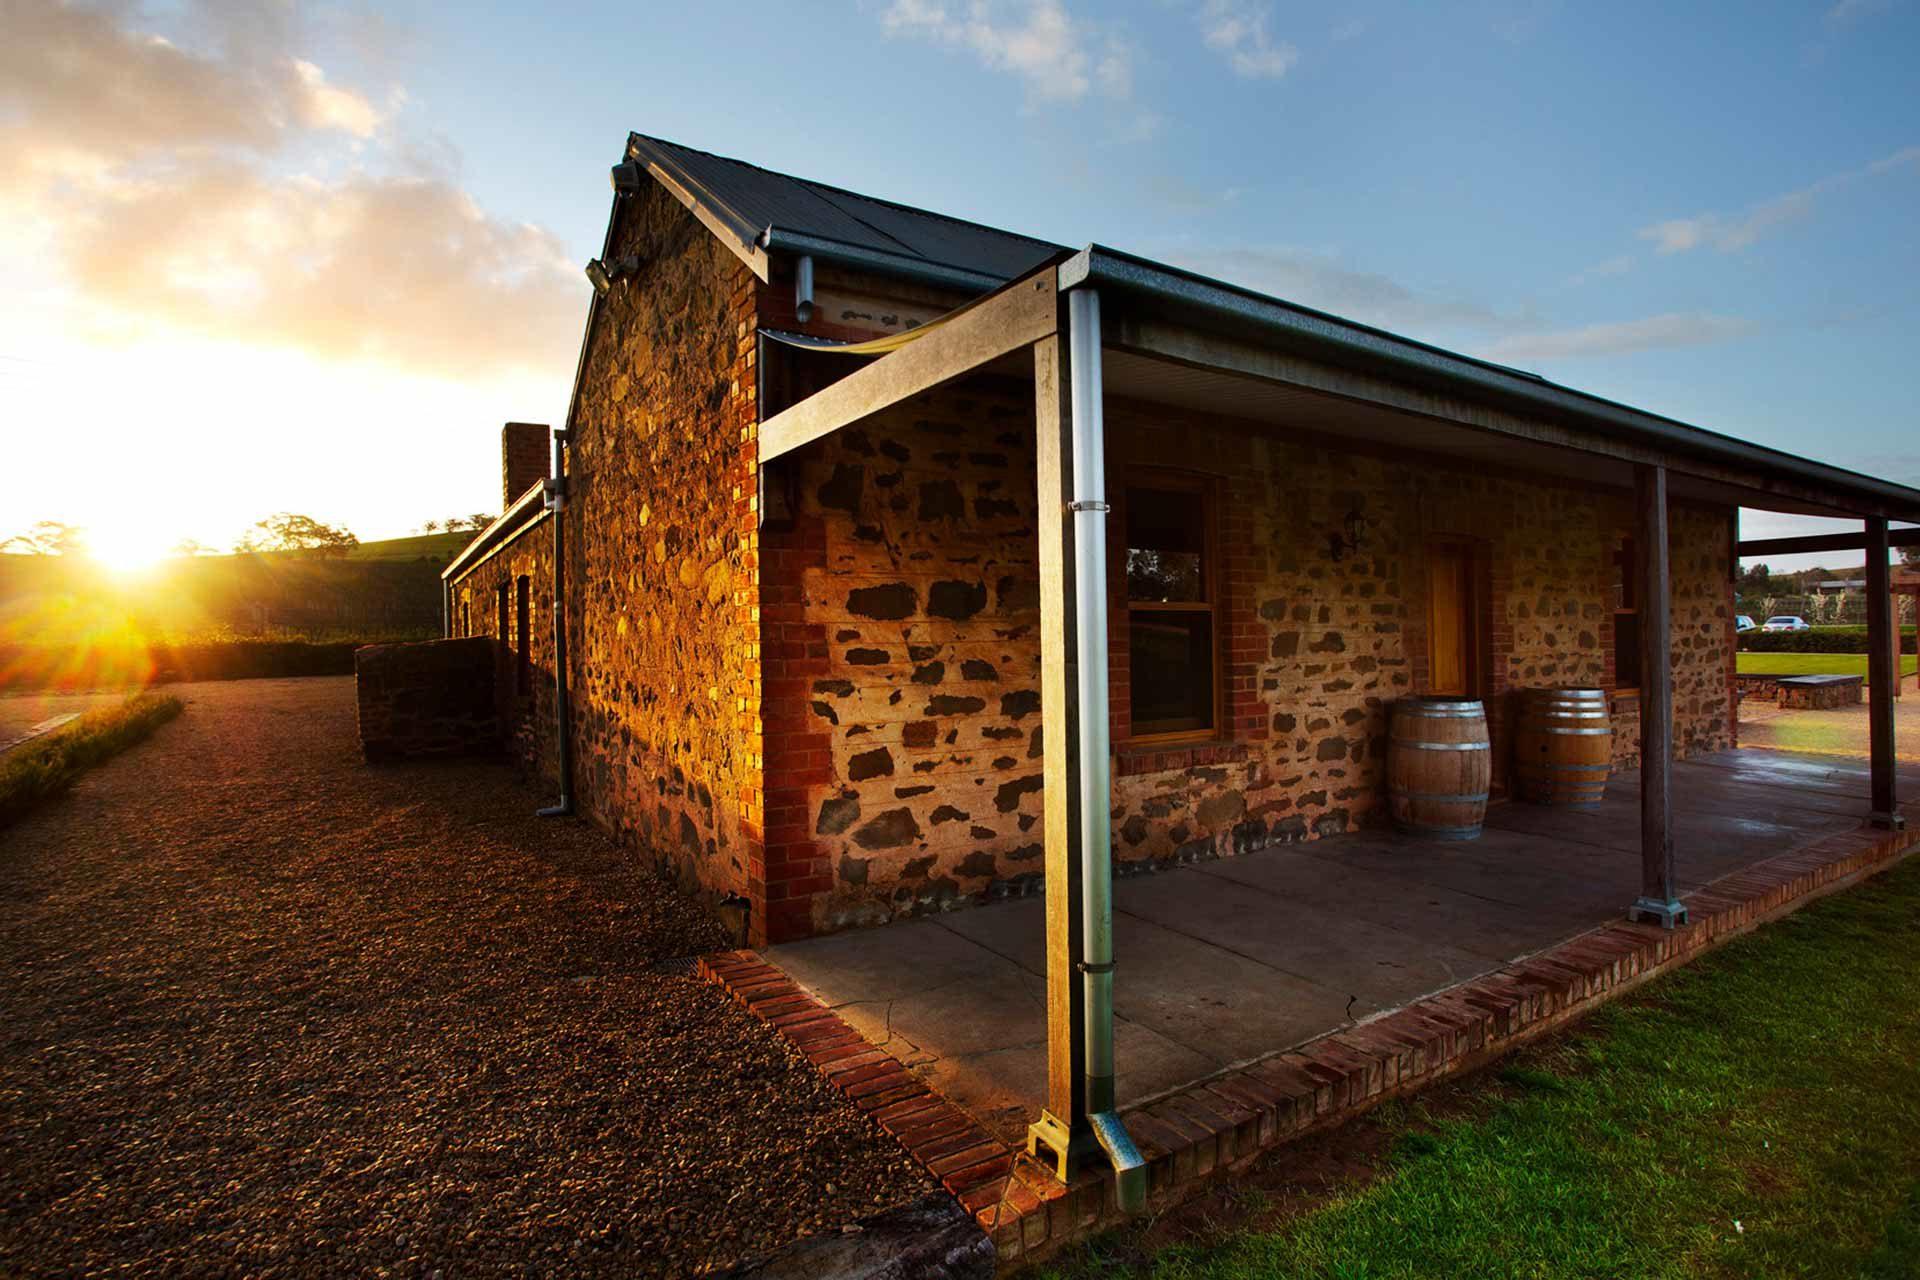 Hentley Farm, Barossa Valley, South Australia / Photo: Dragan Radocaj